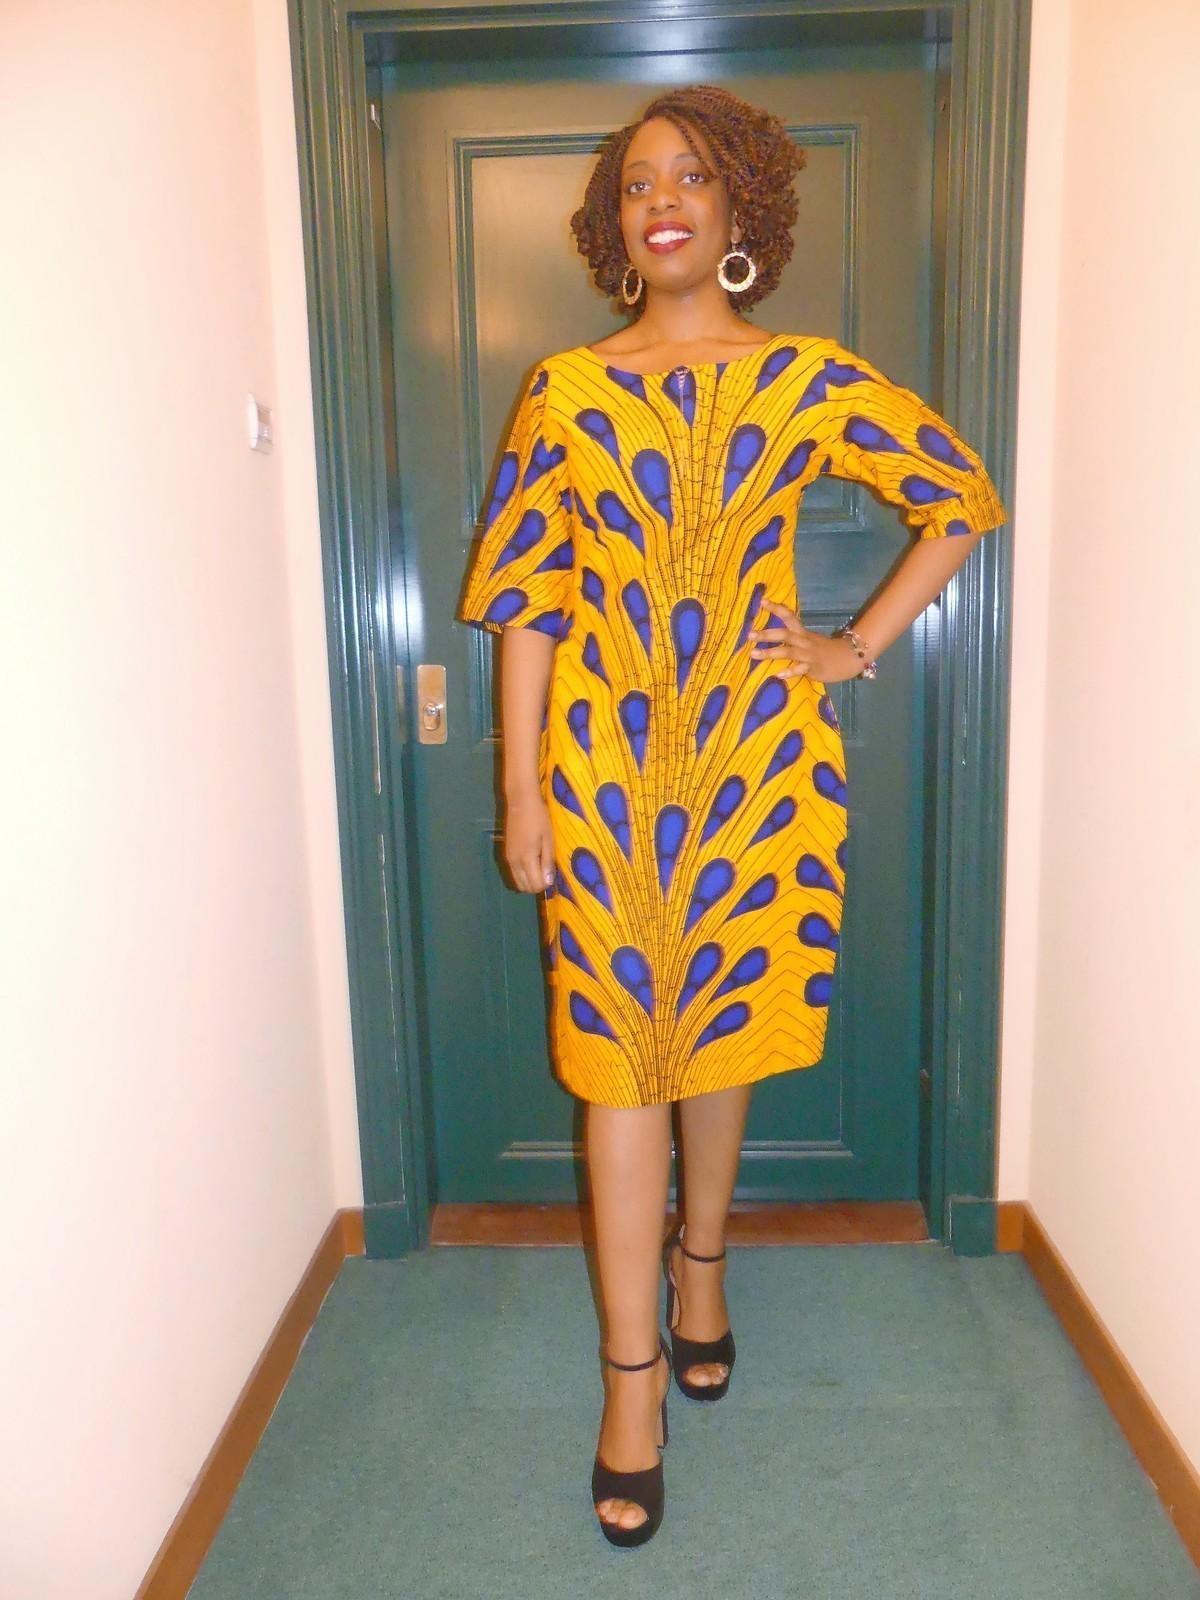 Robe droite en wax ( pagne africain ) par pagnshopea - Robes courtes - Afrikrea